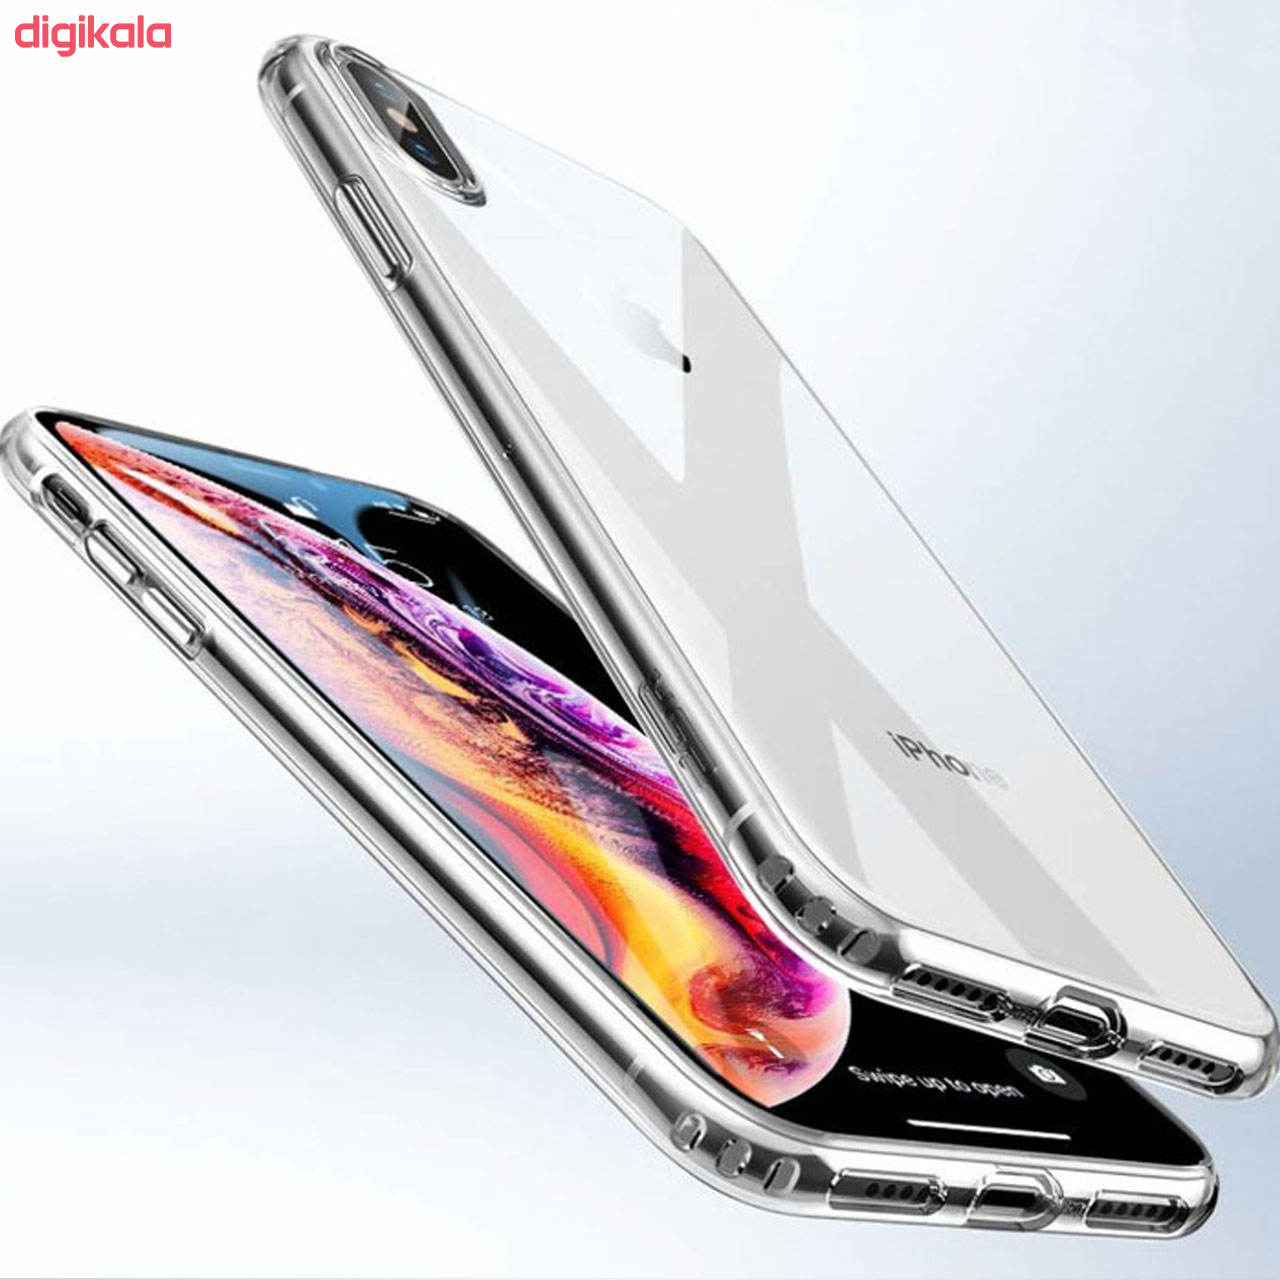 کاور مدل BLKN مناسب برای گوشی موبایل اپل iPhone XS Max main 1 1